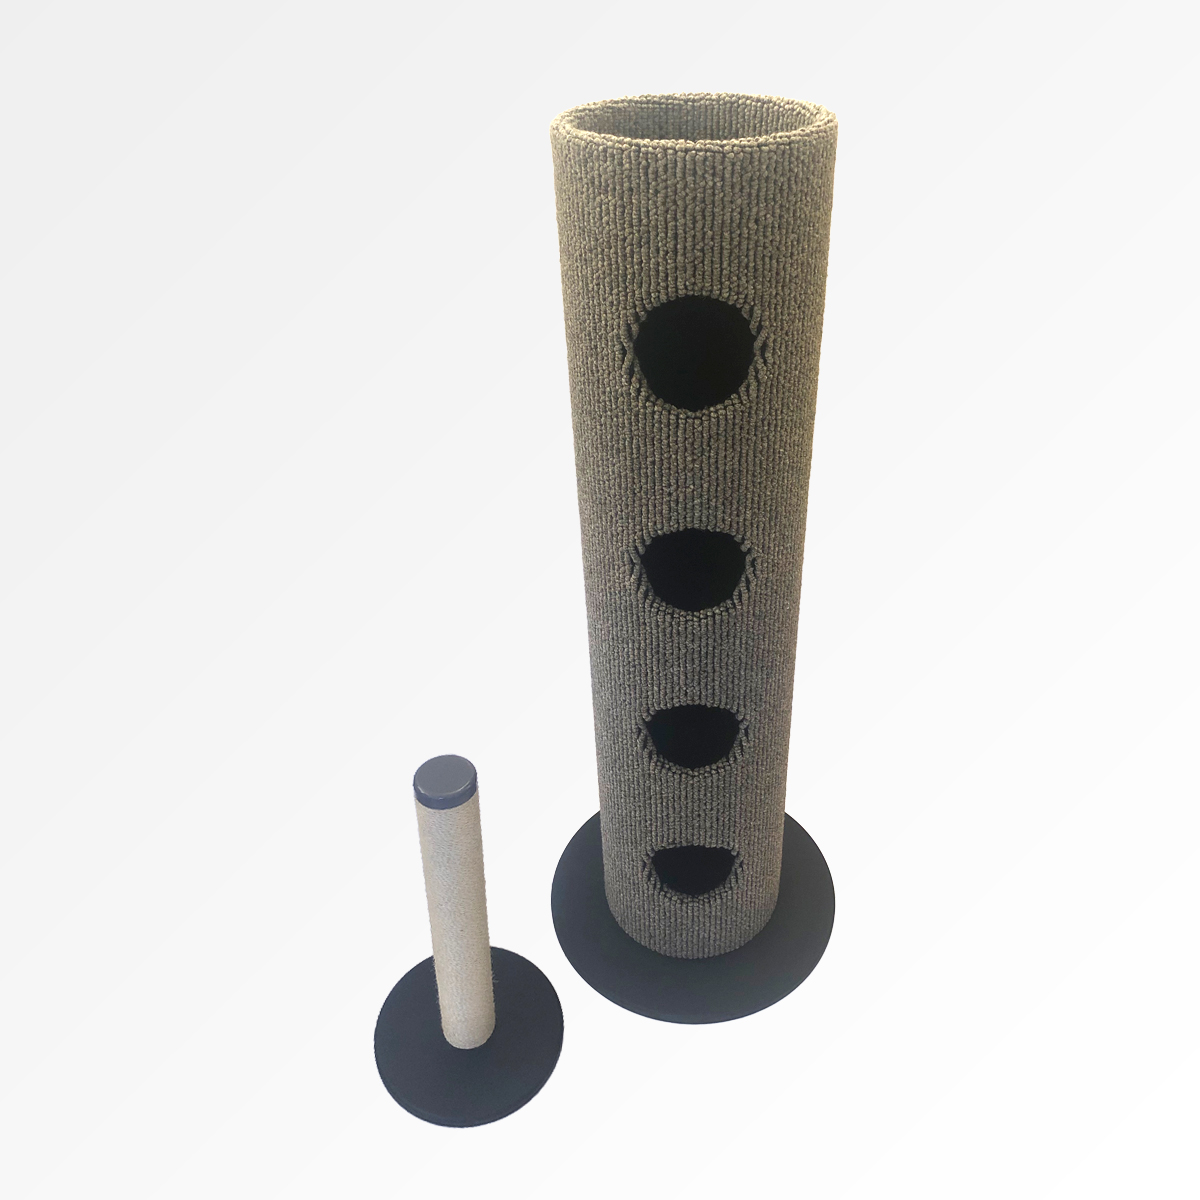 Bespoke Freestanding Fatcat 4 & Scraaaatch™ Stand Pipe